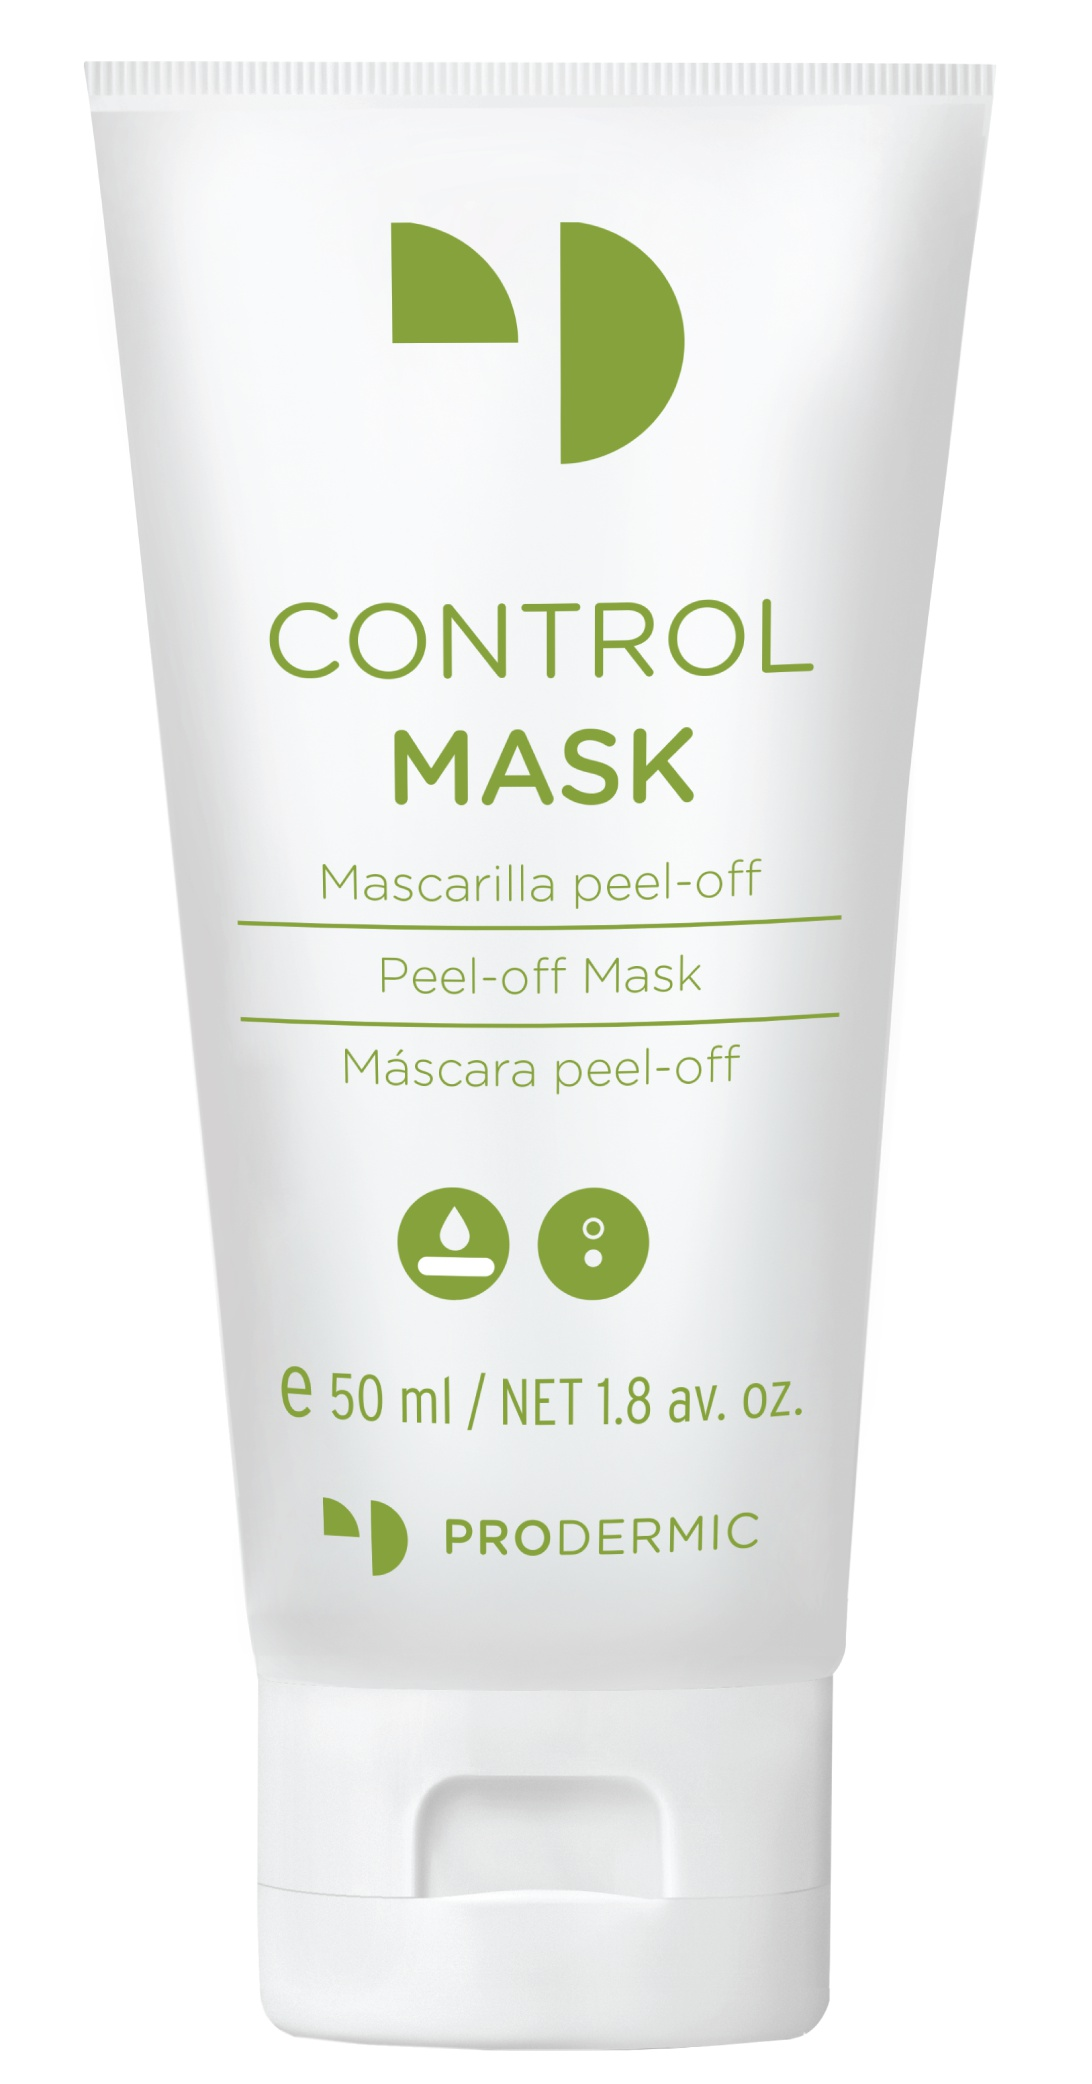 Prodermic Control Mask